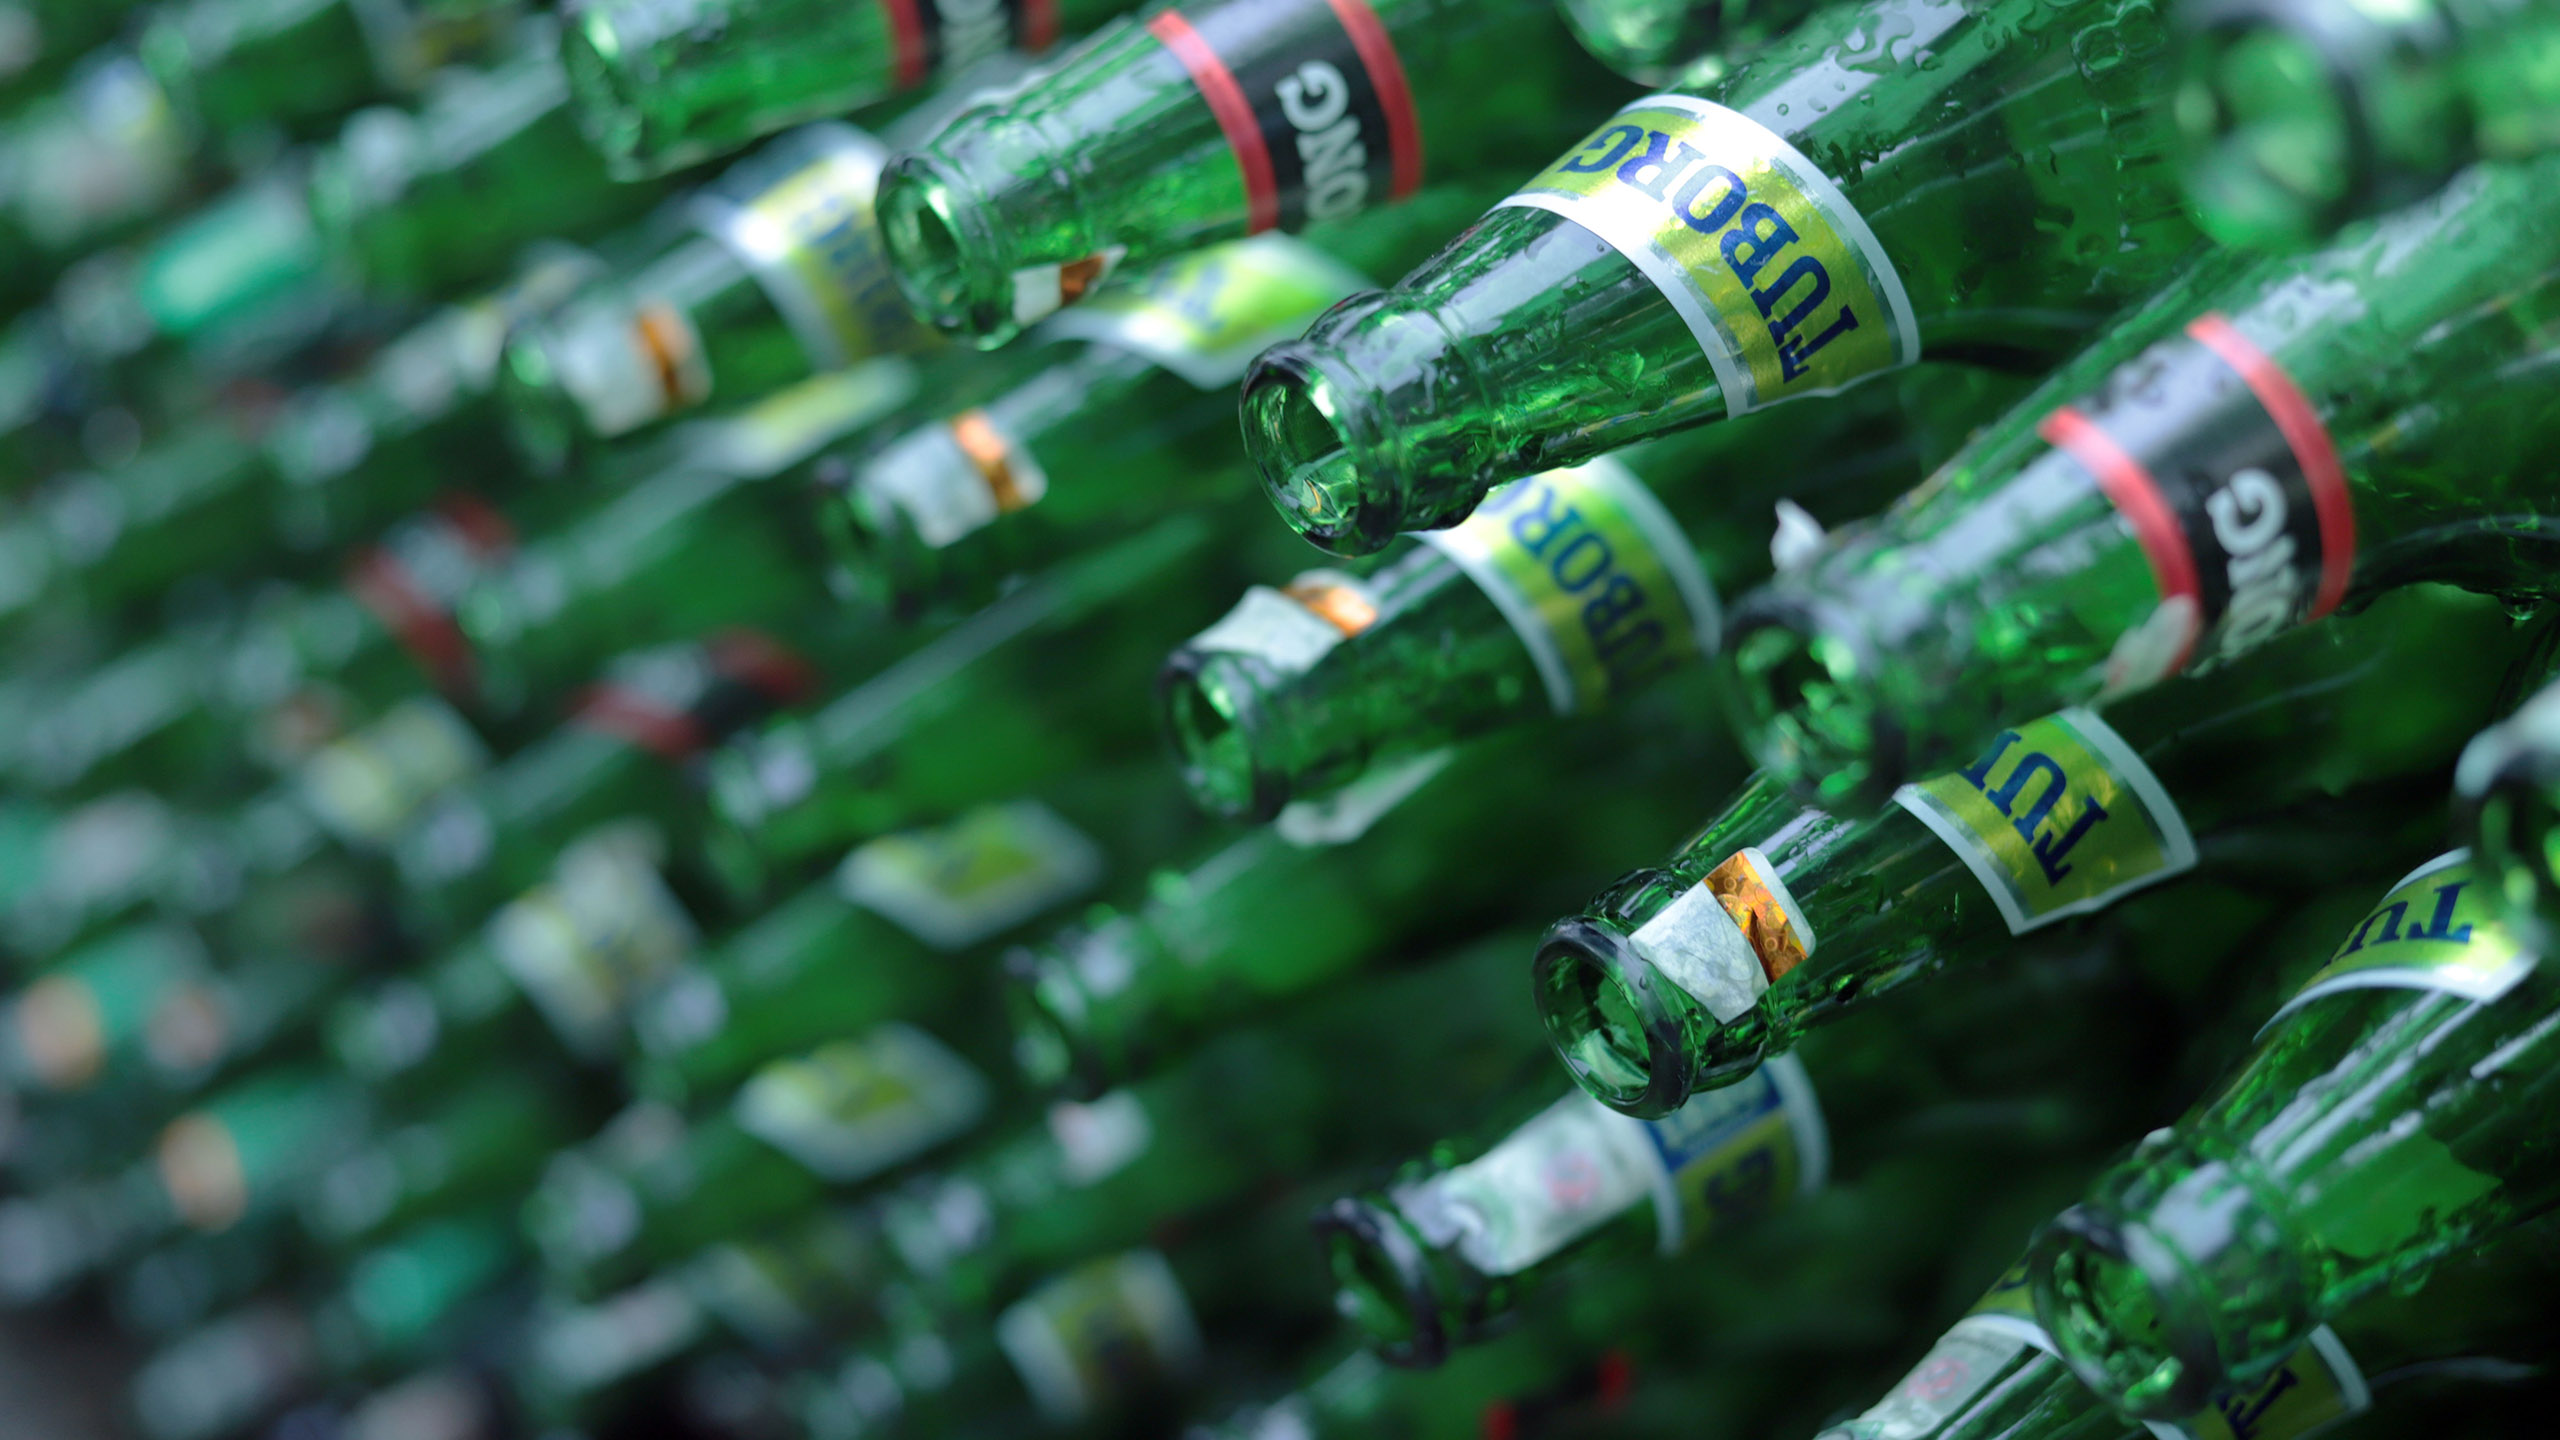 cerveza, botellas de cerveza, etiquetas de cerveza